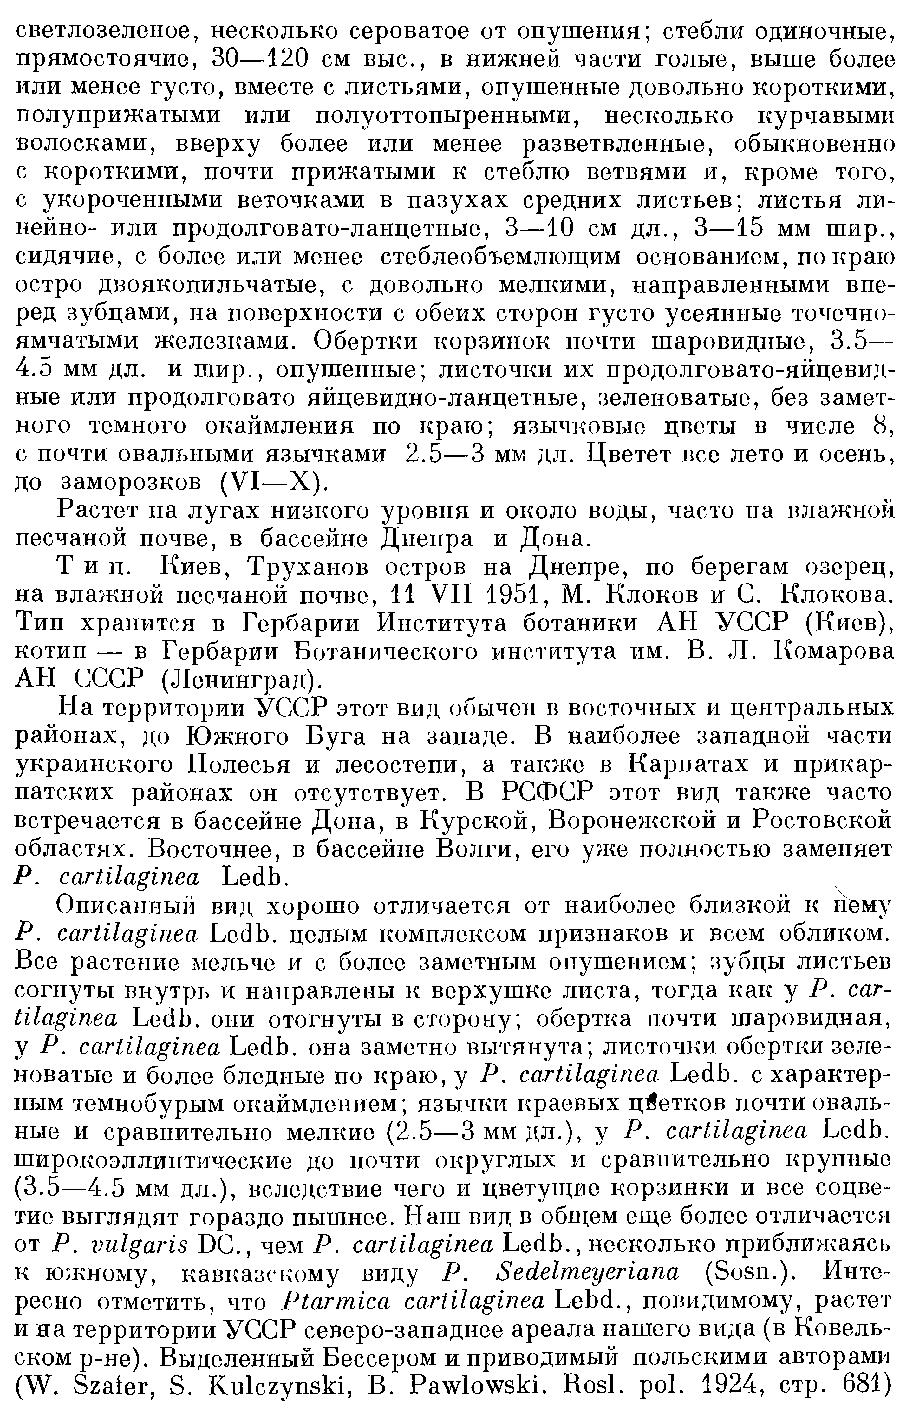 http://forum.plantarium.ru/misc.php?action=pun_attachment&item=13320